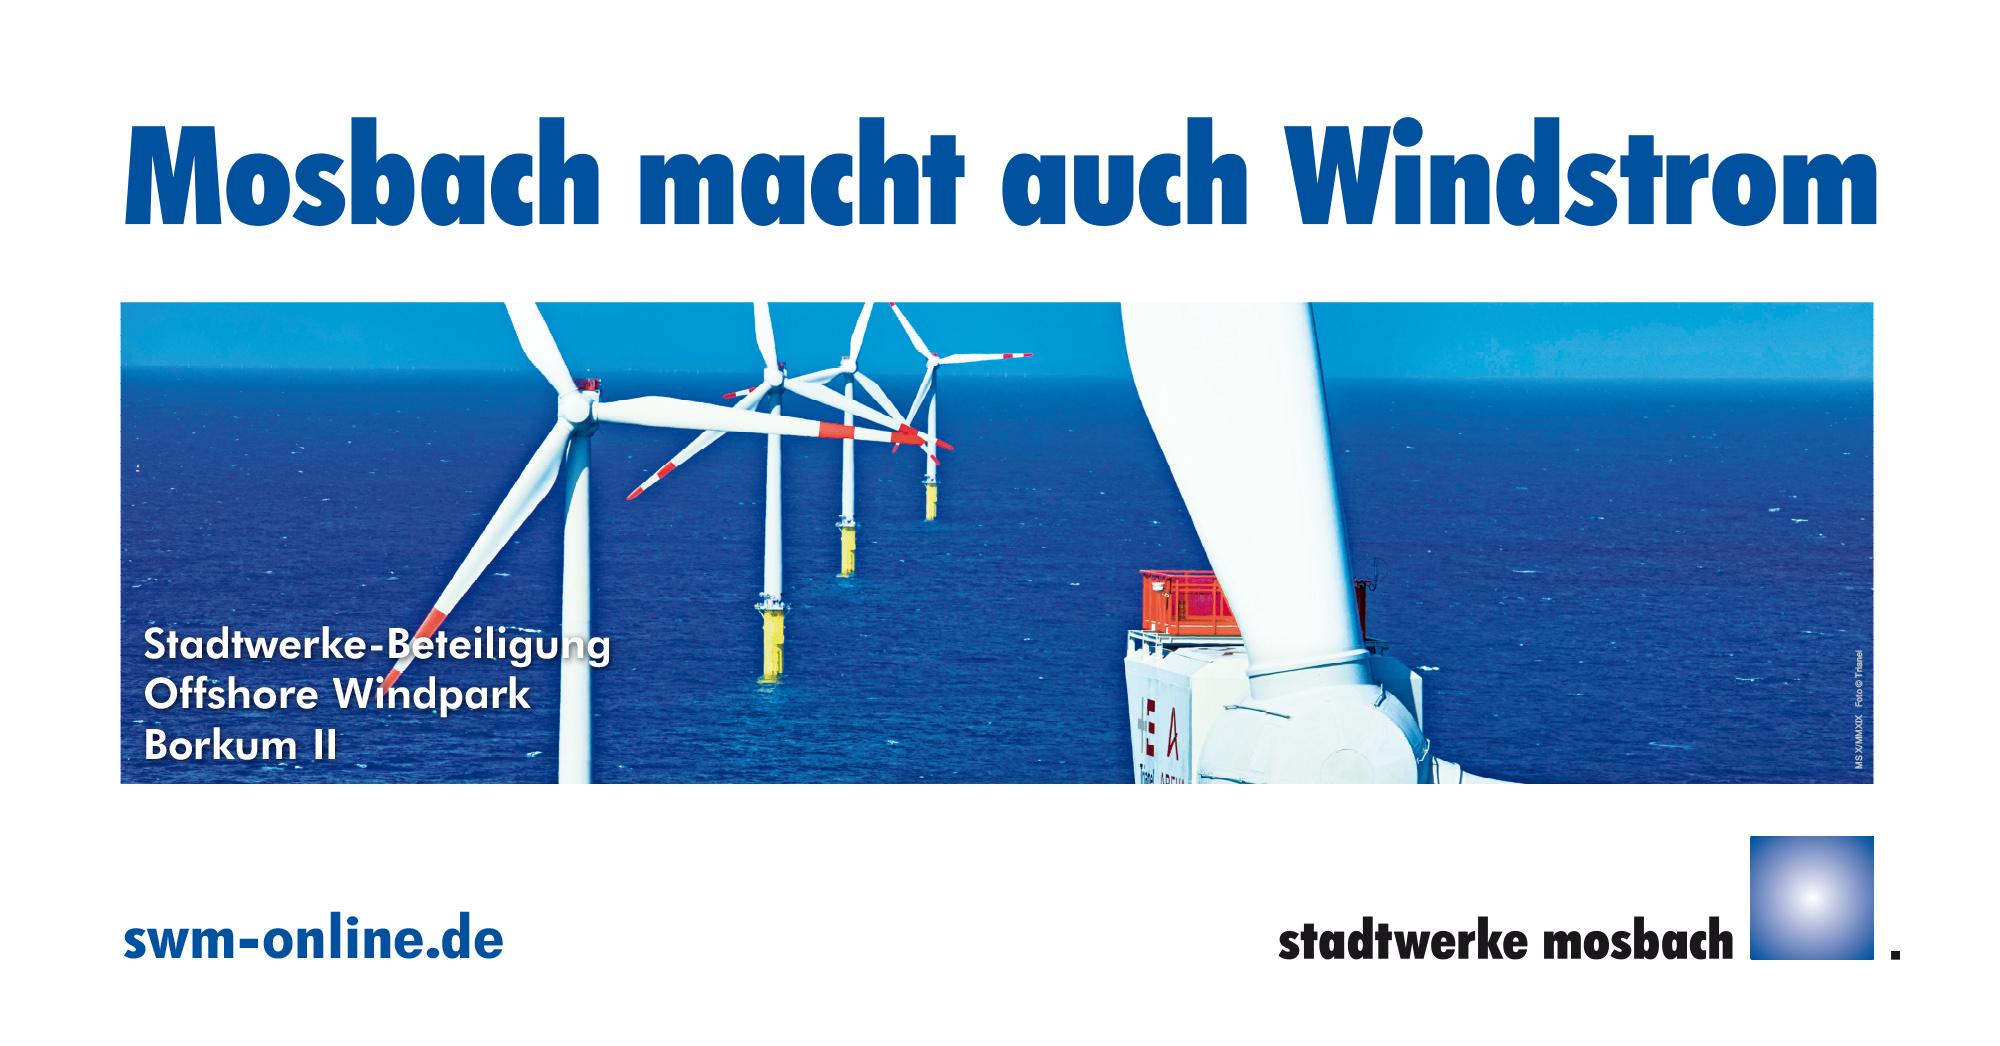 Bauzaunbanner Motiv Stadtwerke Mosbach Windkraft